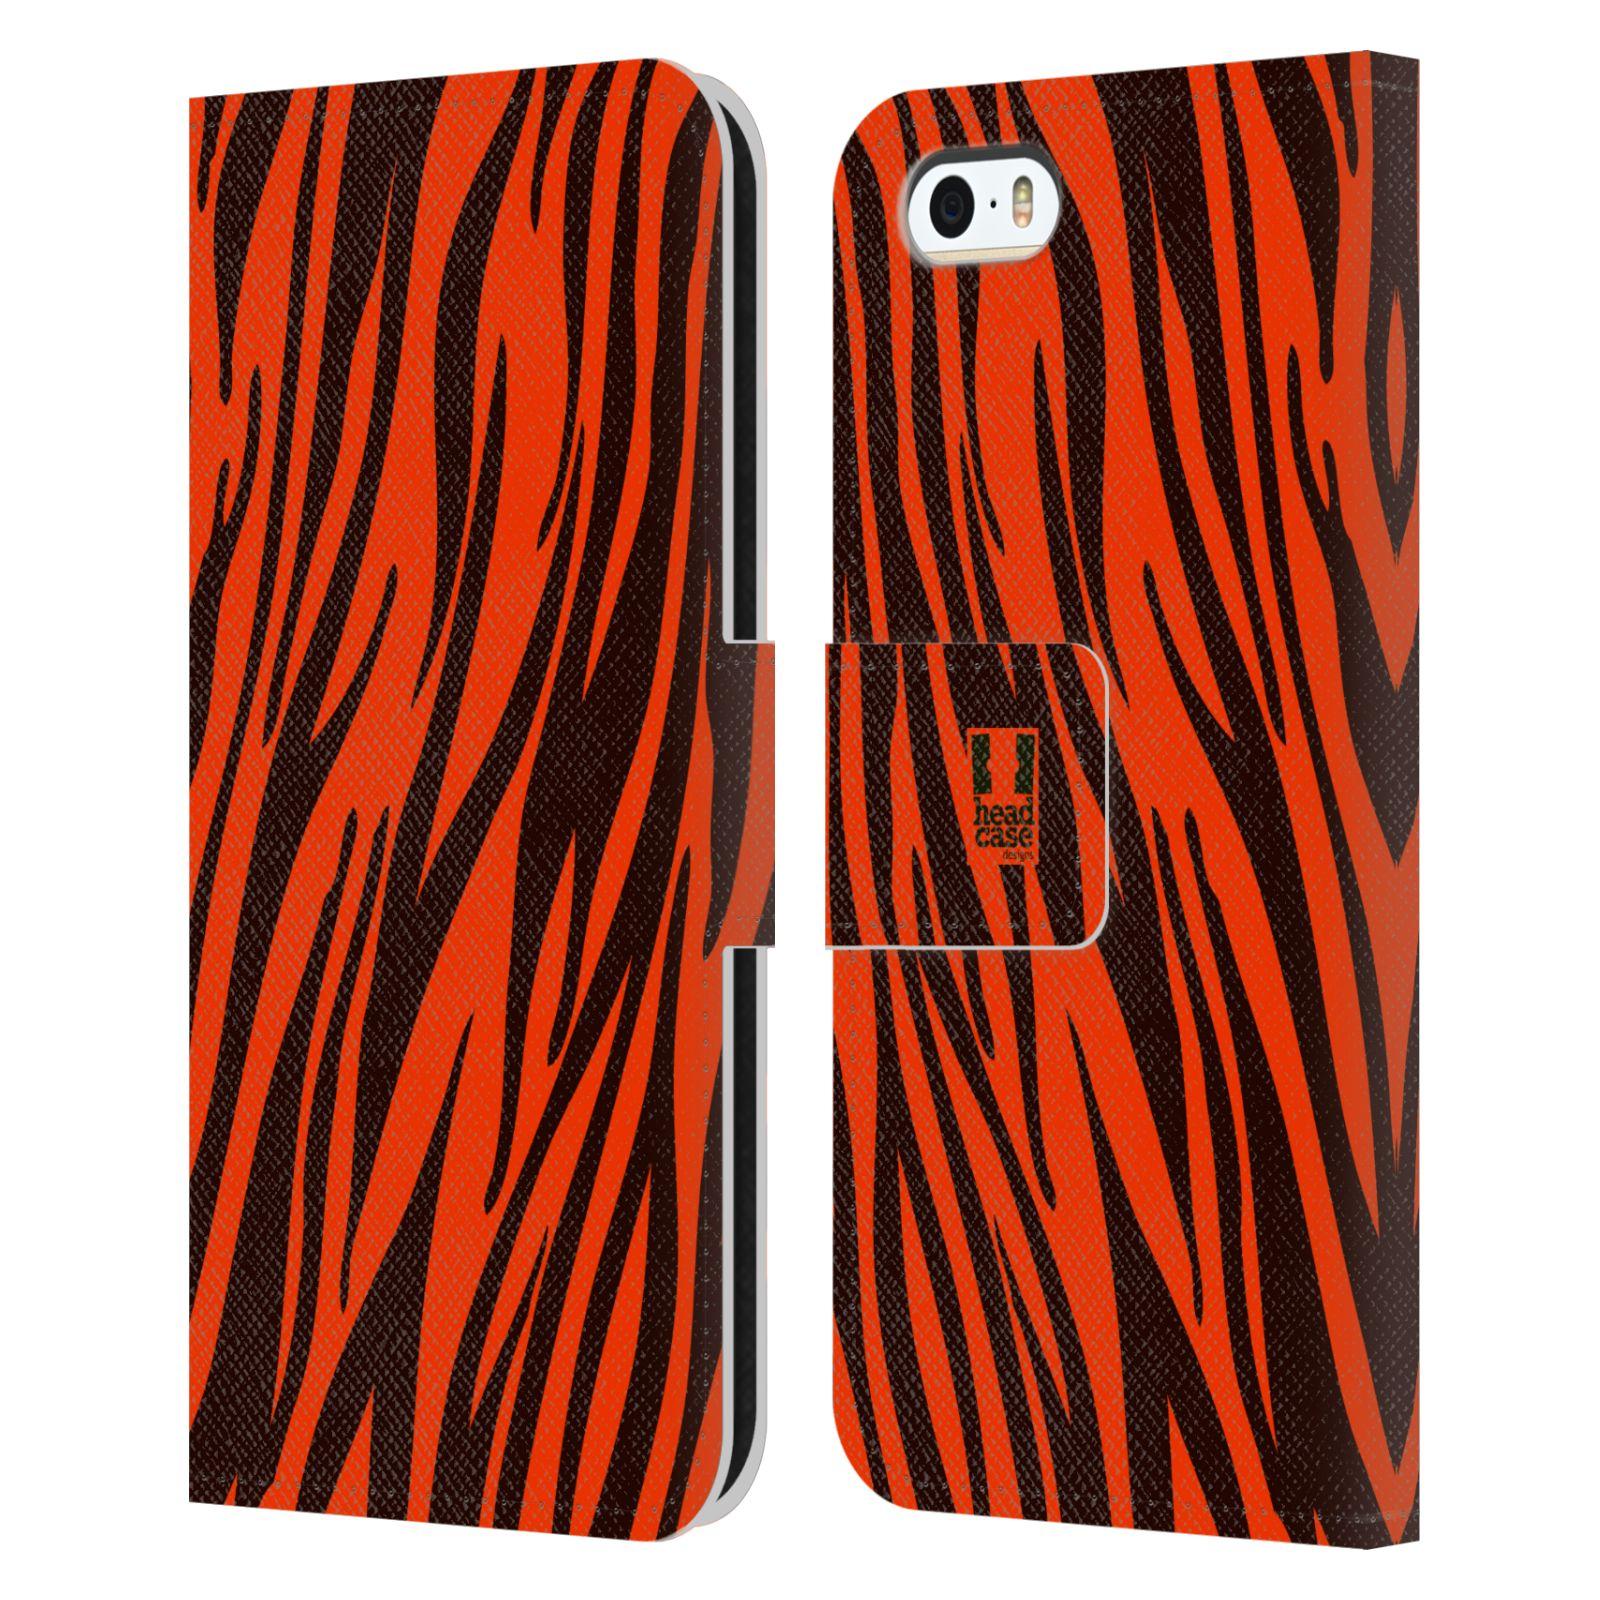 HEAD CASE Flipové pouzdro pro mobil Apple Iphone 5/5s Zvířecí barevné vzory oranžový tygr